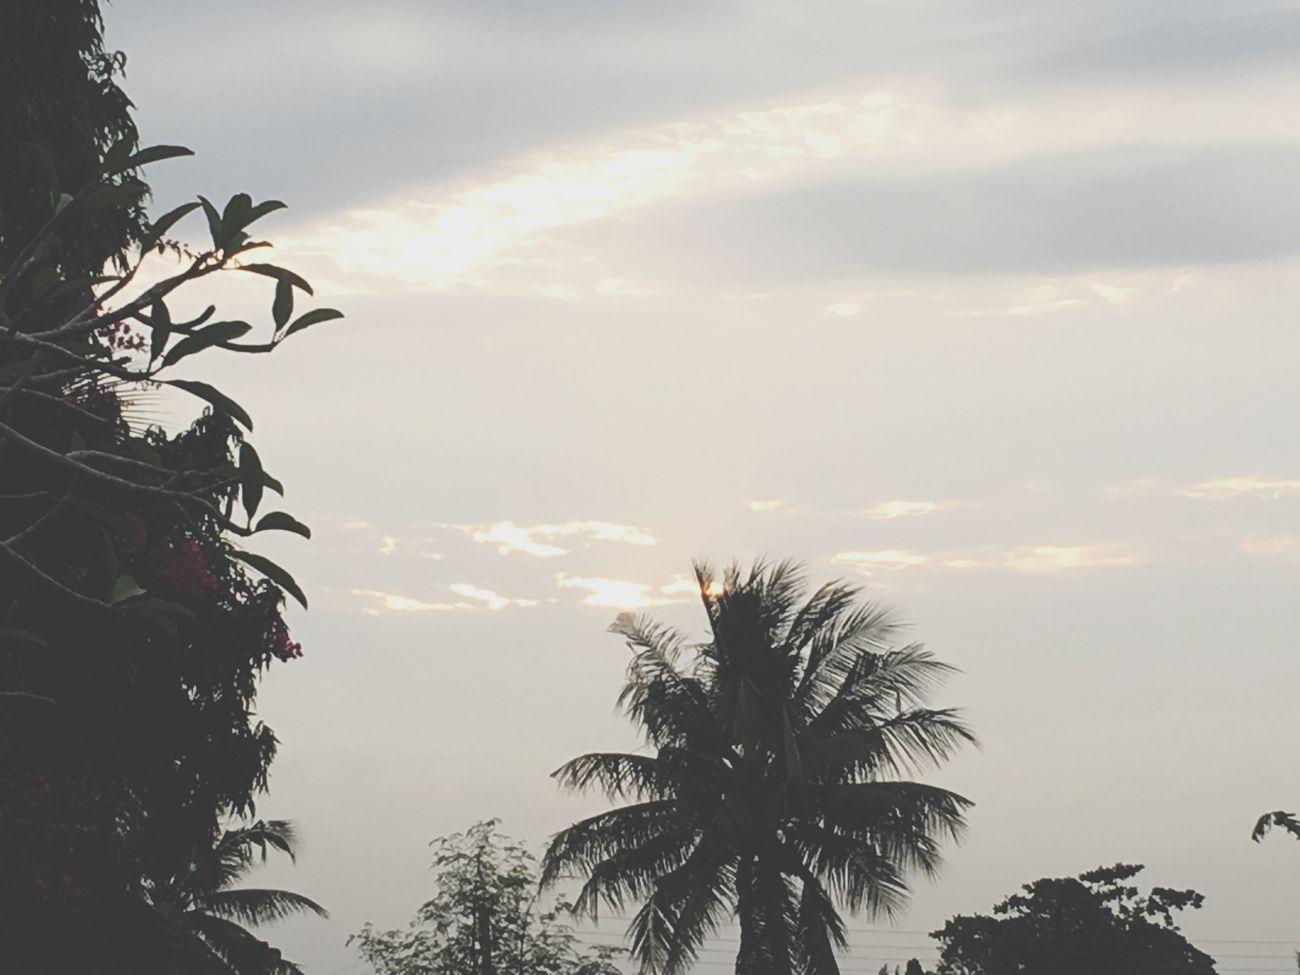 Love the Palms!